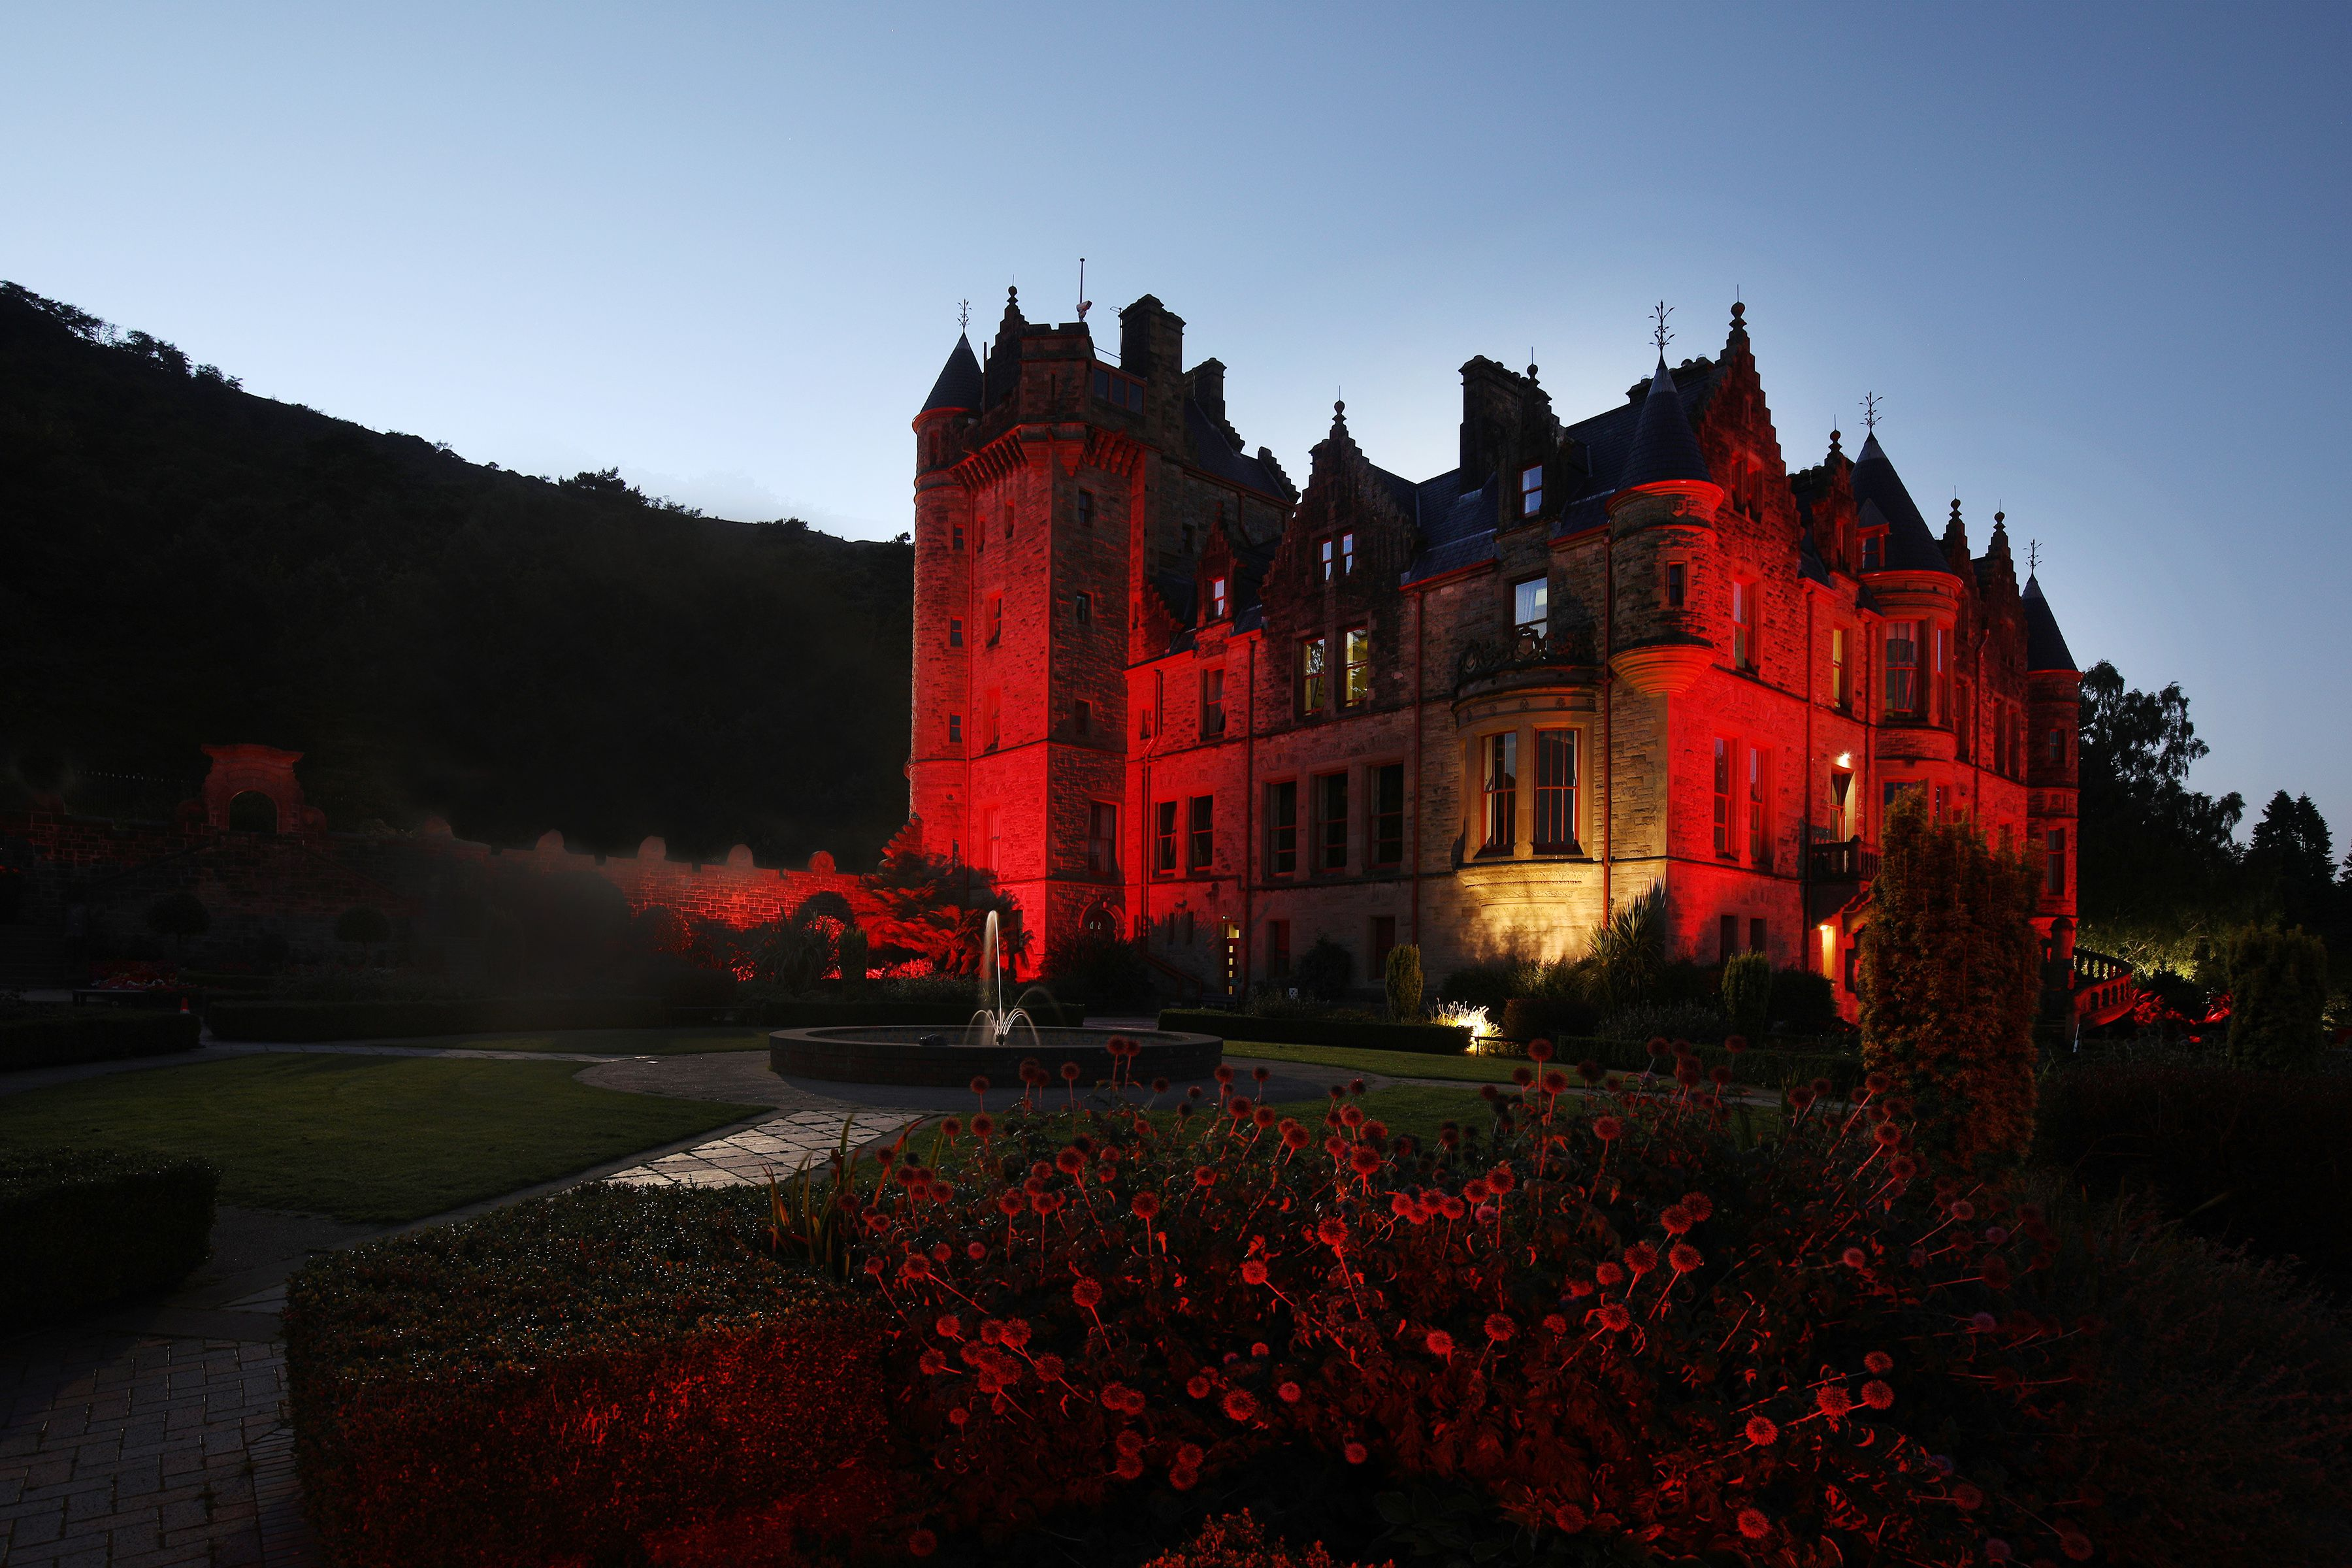 RED: Belfast Castle was lit up for Blood Cancer Awareness Month in September